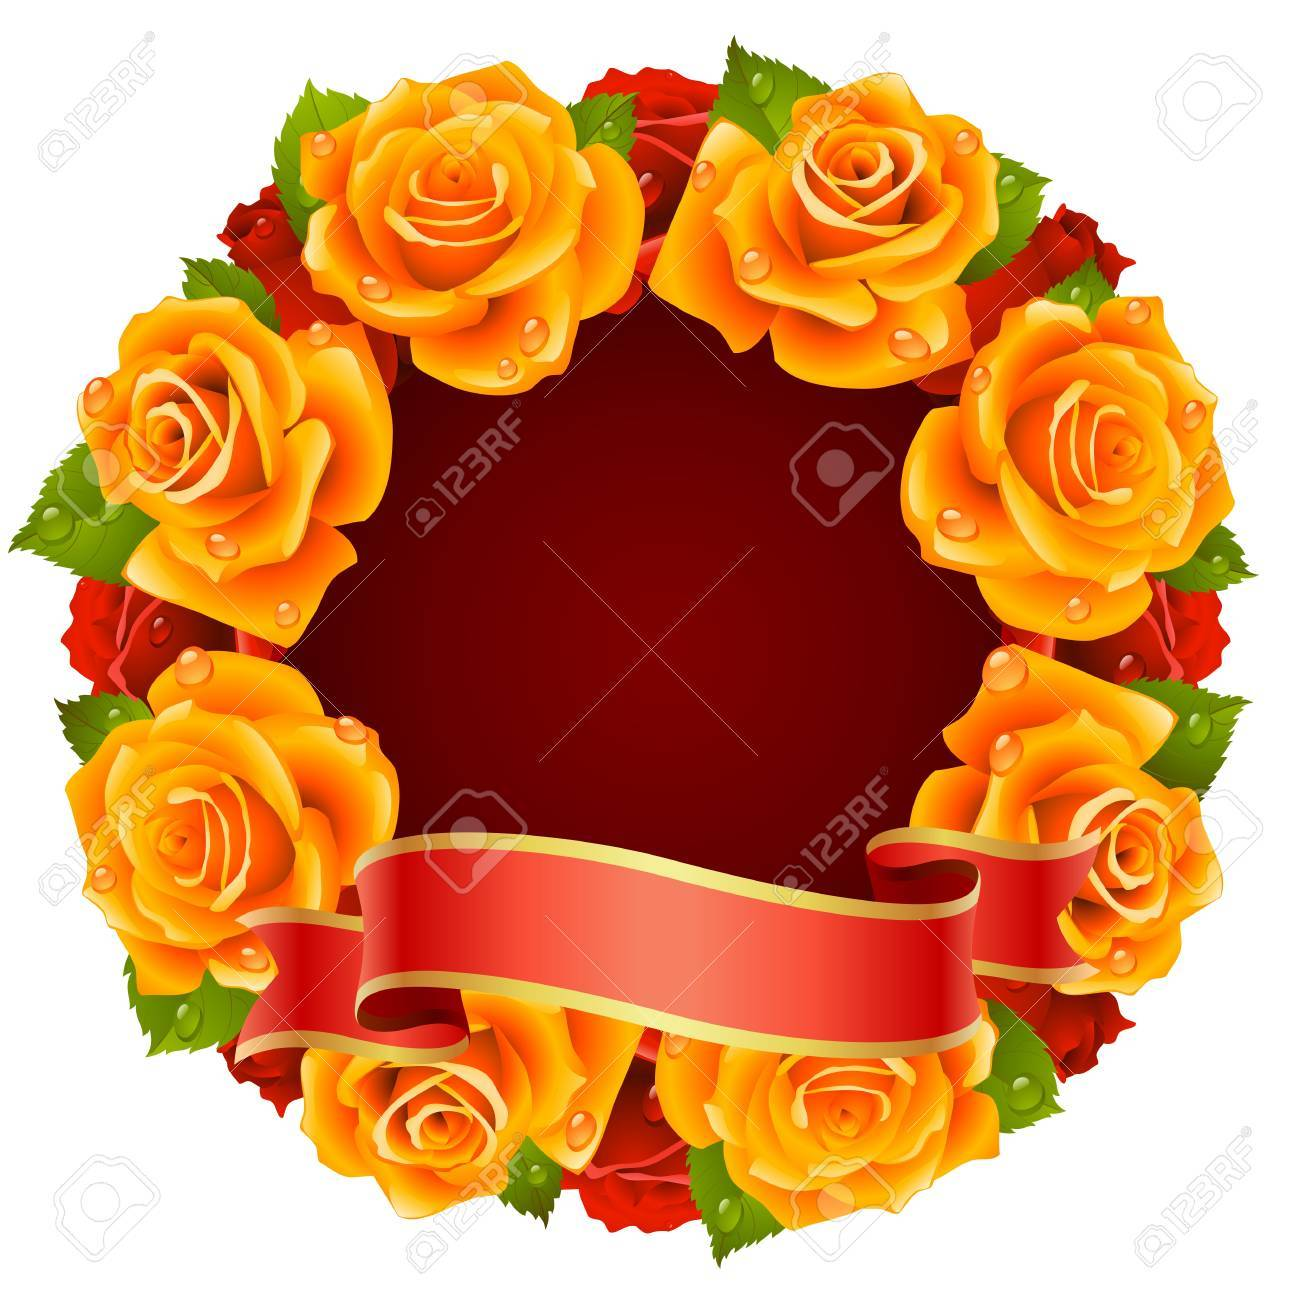 orange Rose Frame in the shape of round Stock Vector - 8202471